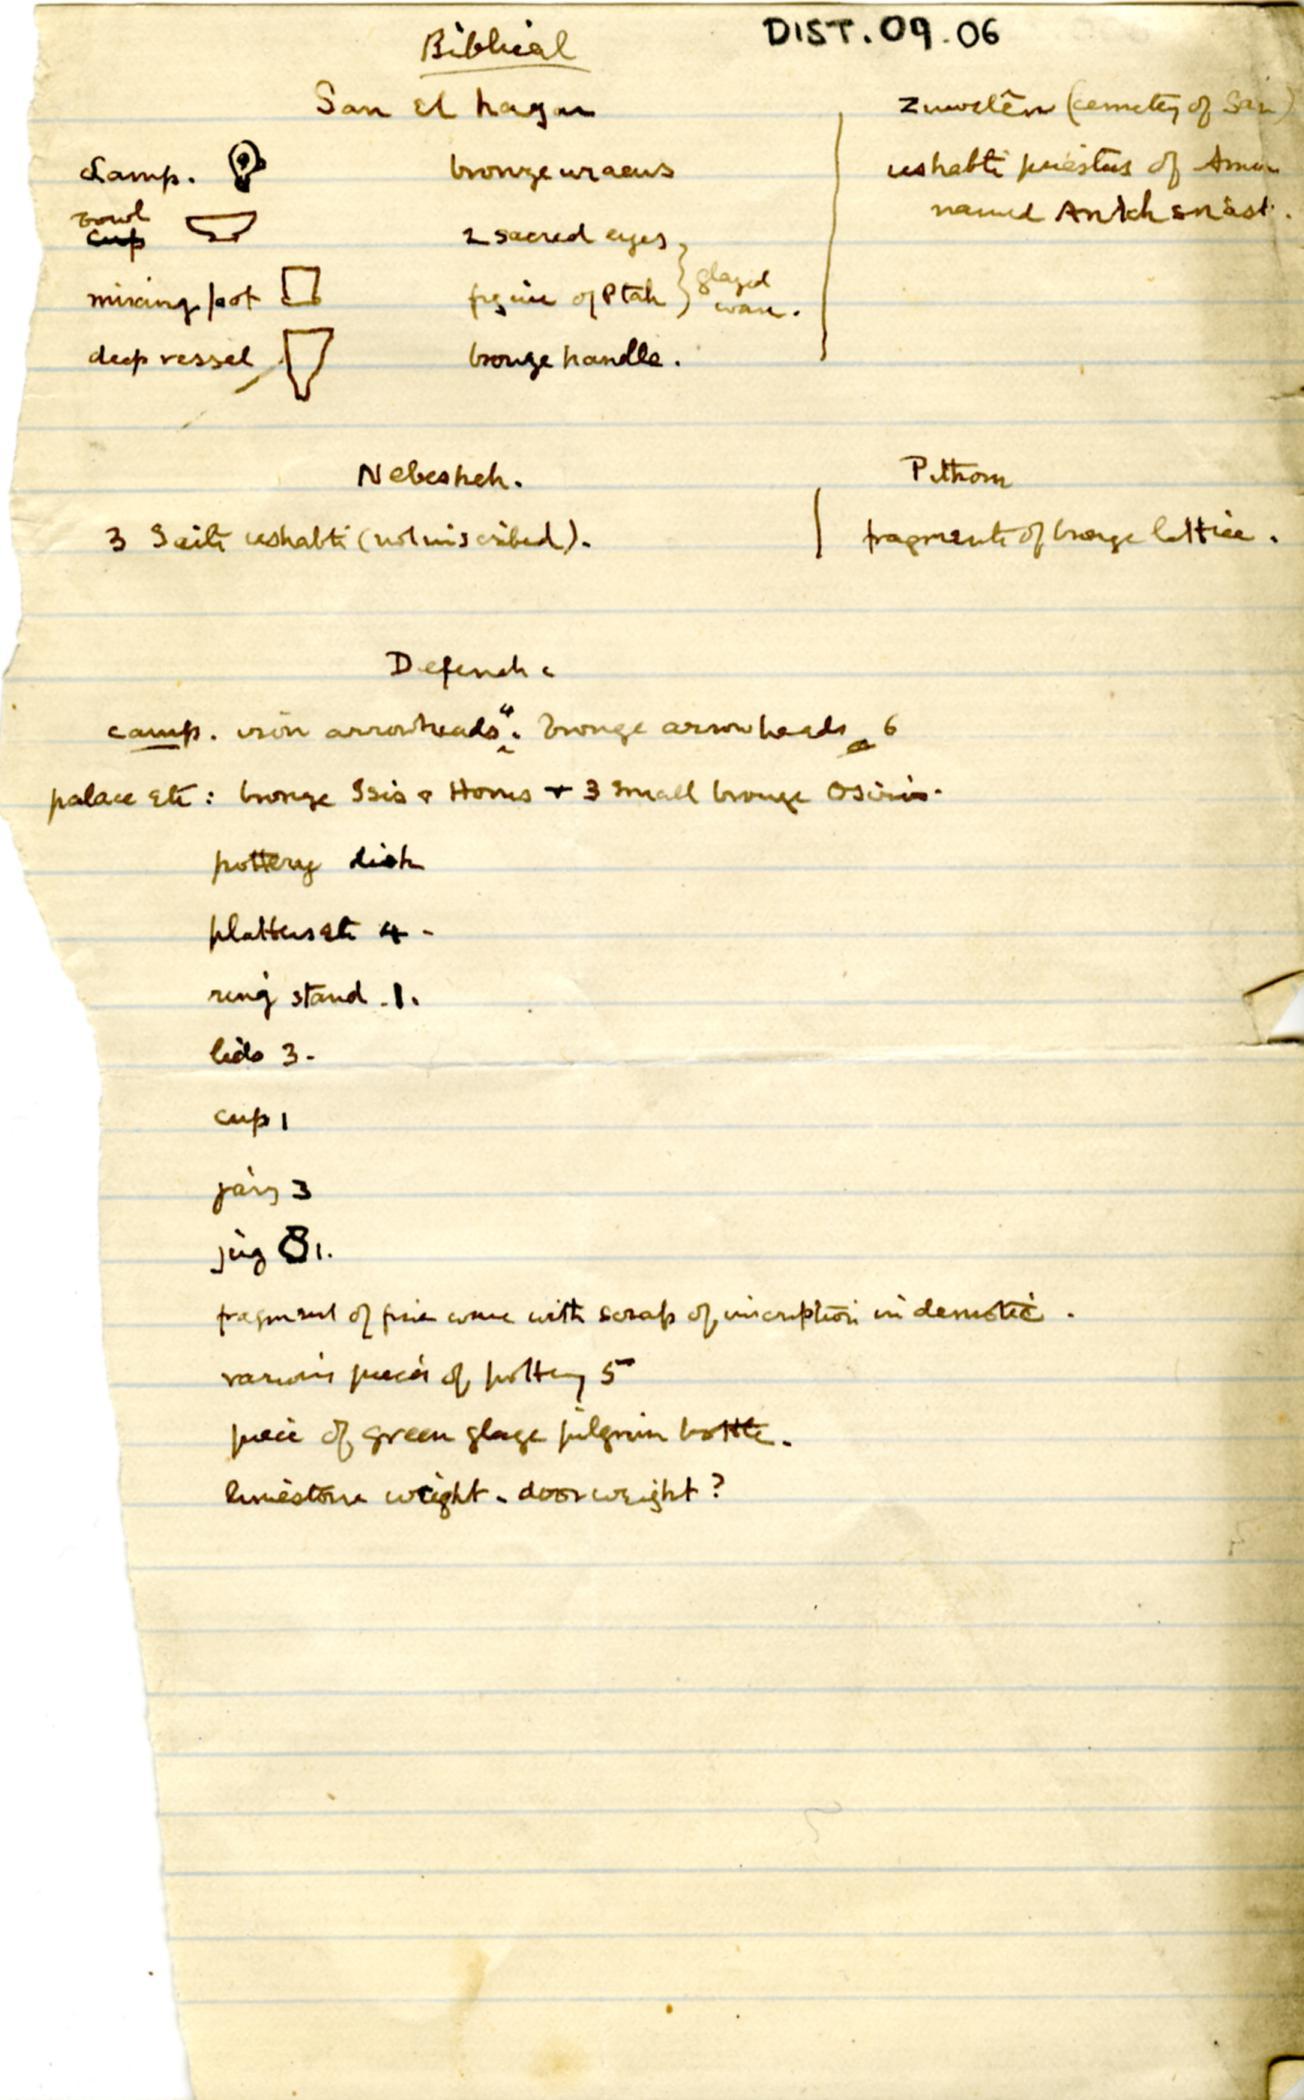 1886 Nebesheh Tell Dafana 1884 el-Qantara, Tell Gemayemi, Tell Sueilin DIST.09.06